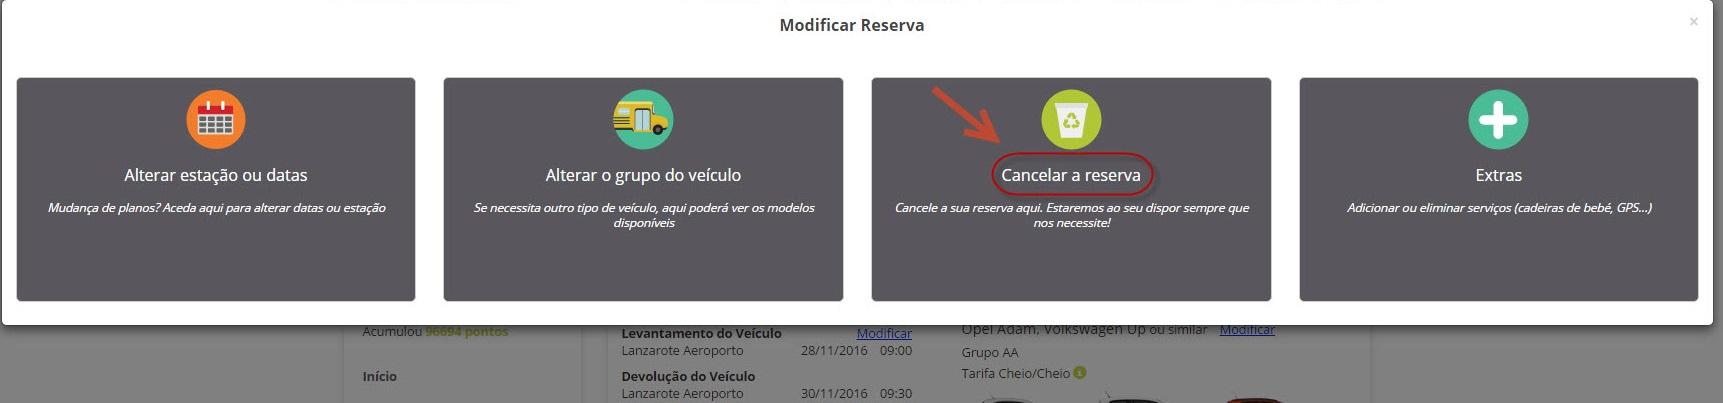 Como cancelo a minha reserva? (4)